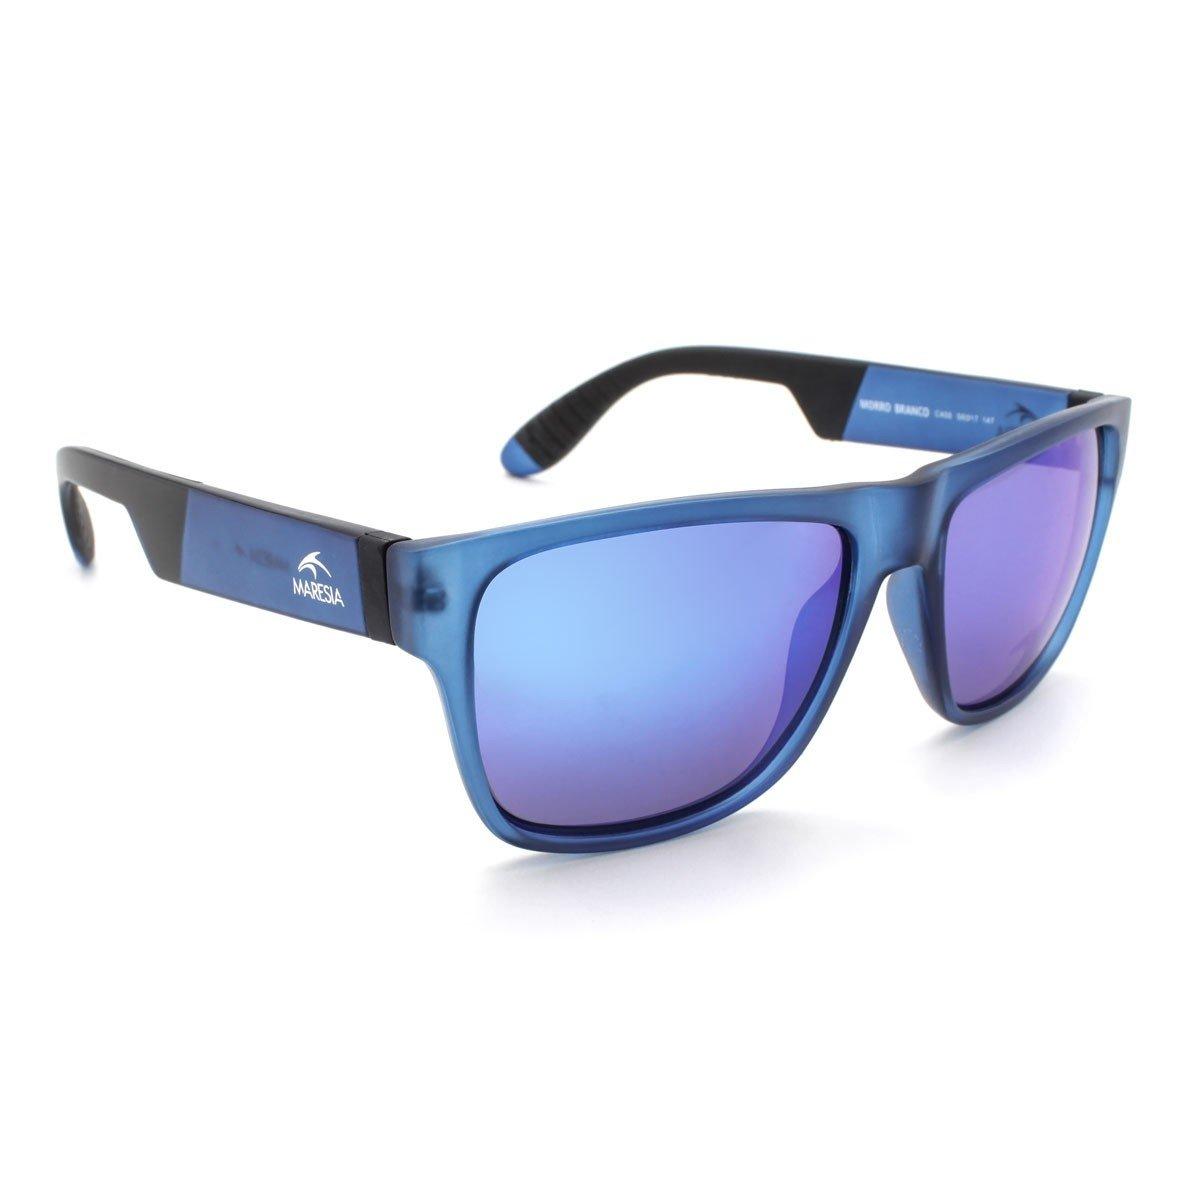 5502d7b92e10d Óculos De Sol Maresia Morro Branco - Compre Agora   Netshoes